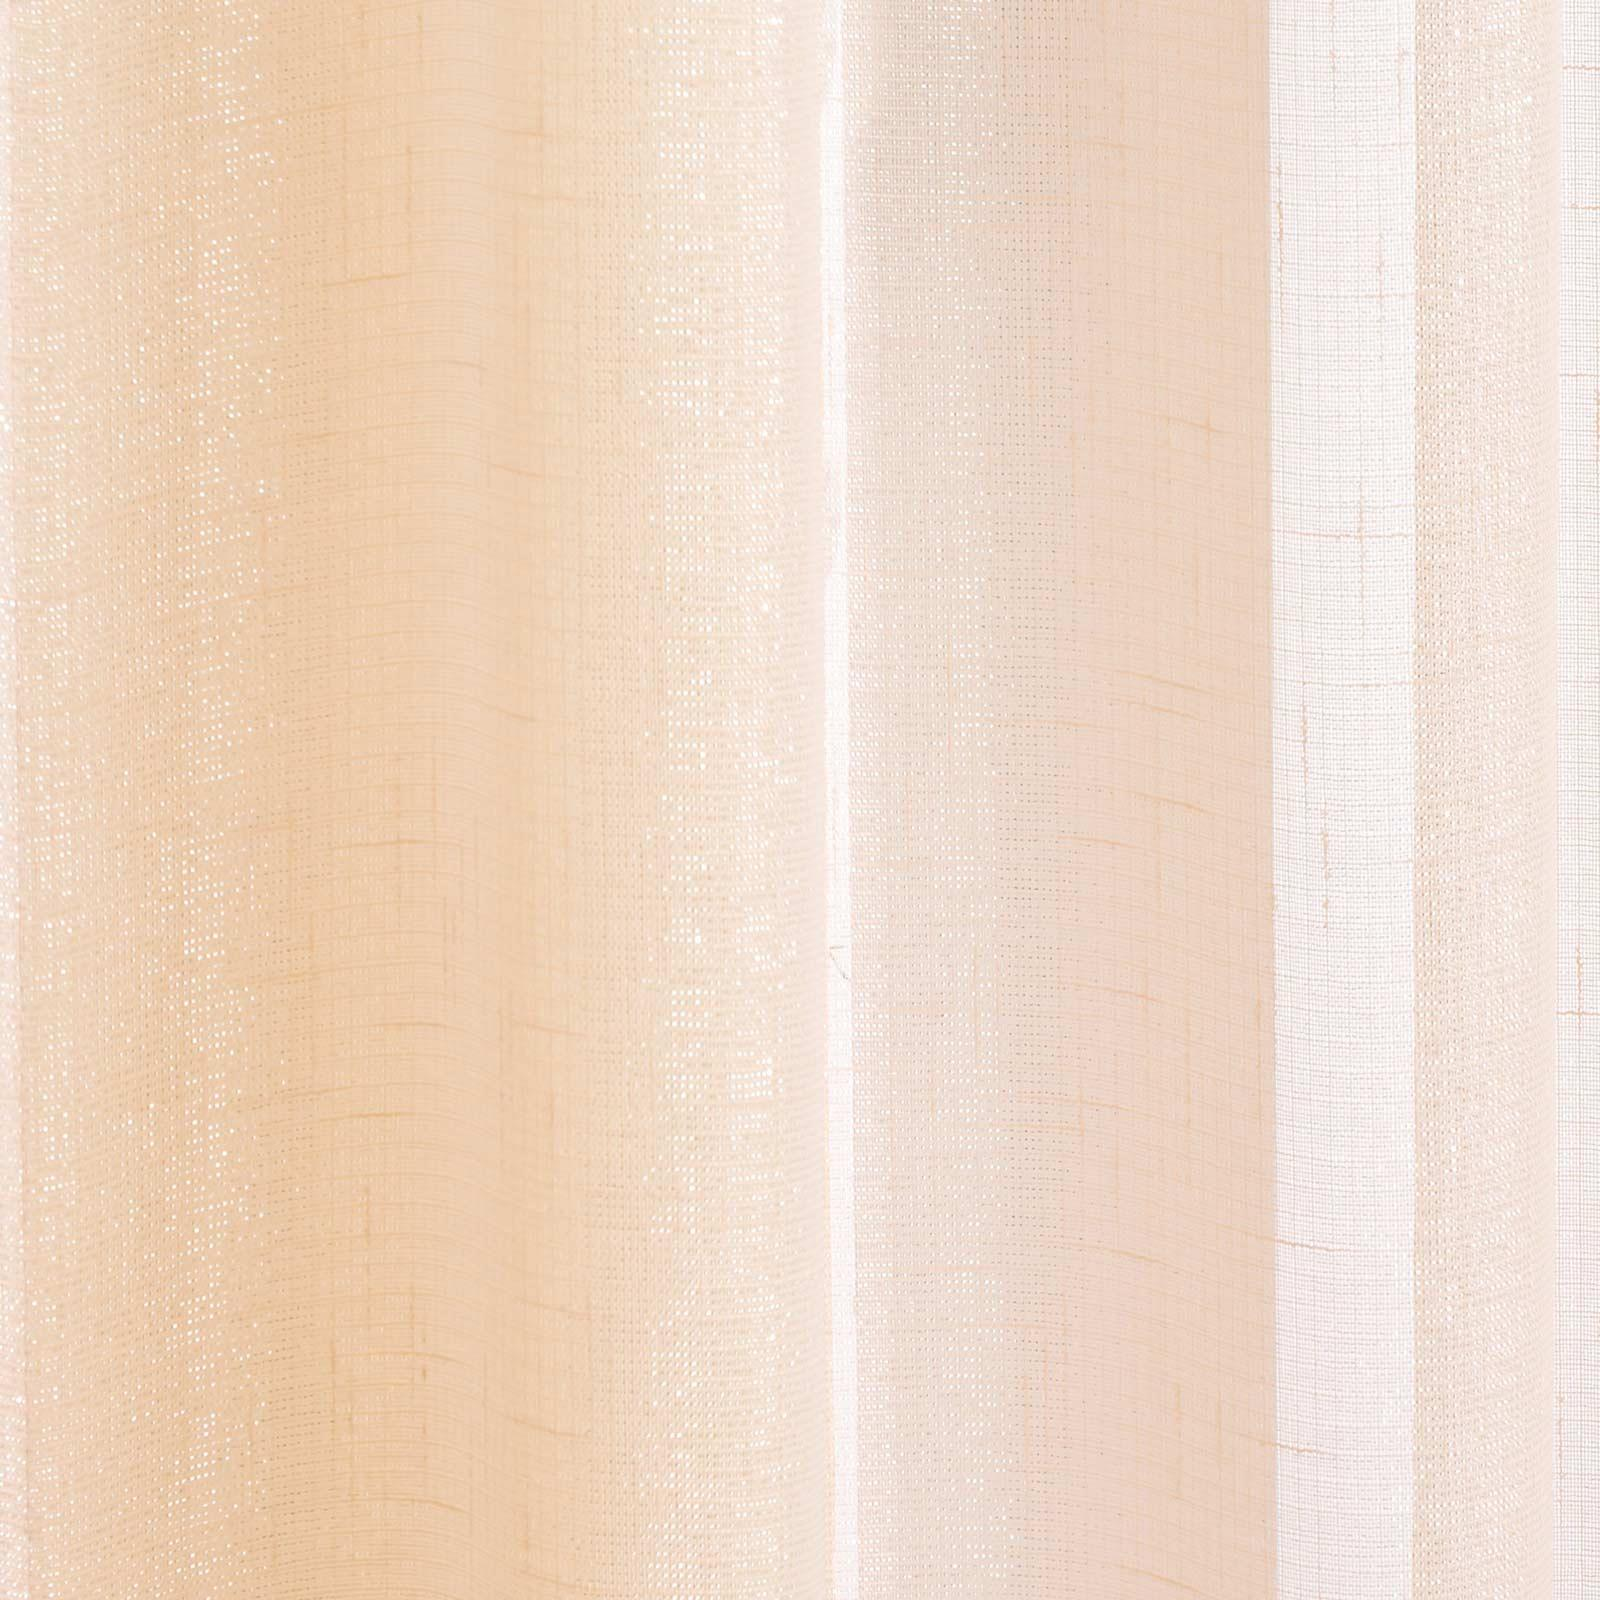 Casablanca Voile Curtain Sparkle Metallic Slot Top Panel Rod Pocket Sheer Voiles